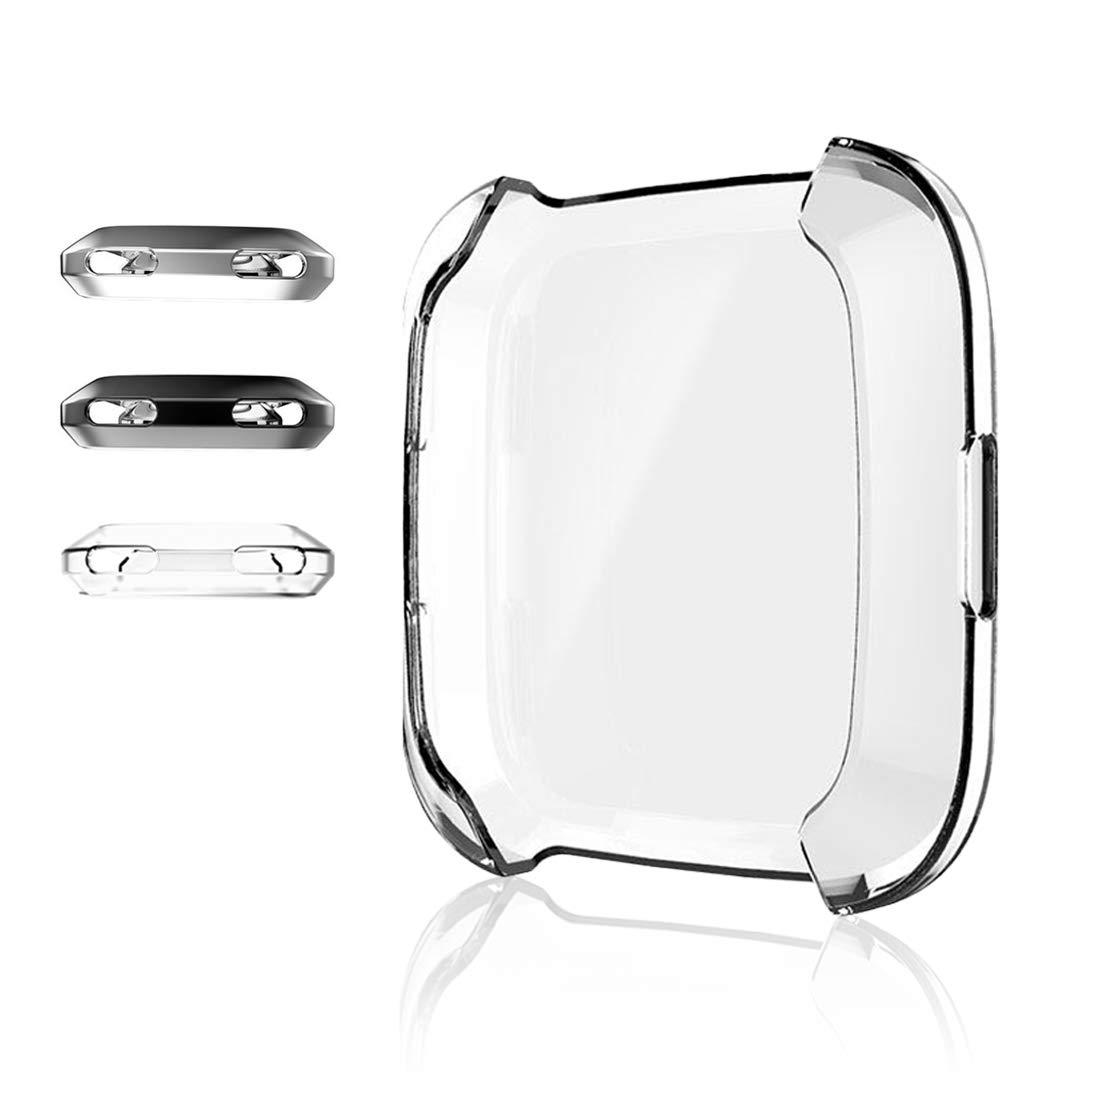 ZUOYI Fitbit Versa Funda, Protector de Pantalla Cubierta Protectora Completa Carcasa para Fitbit Versa Smartwatch,Transparente